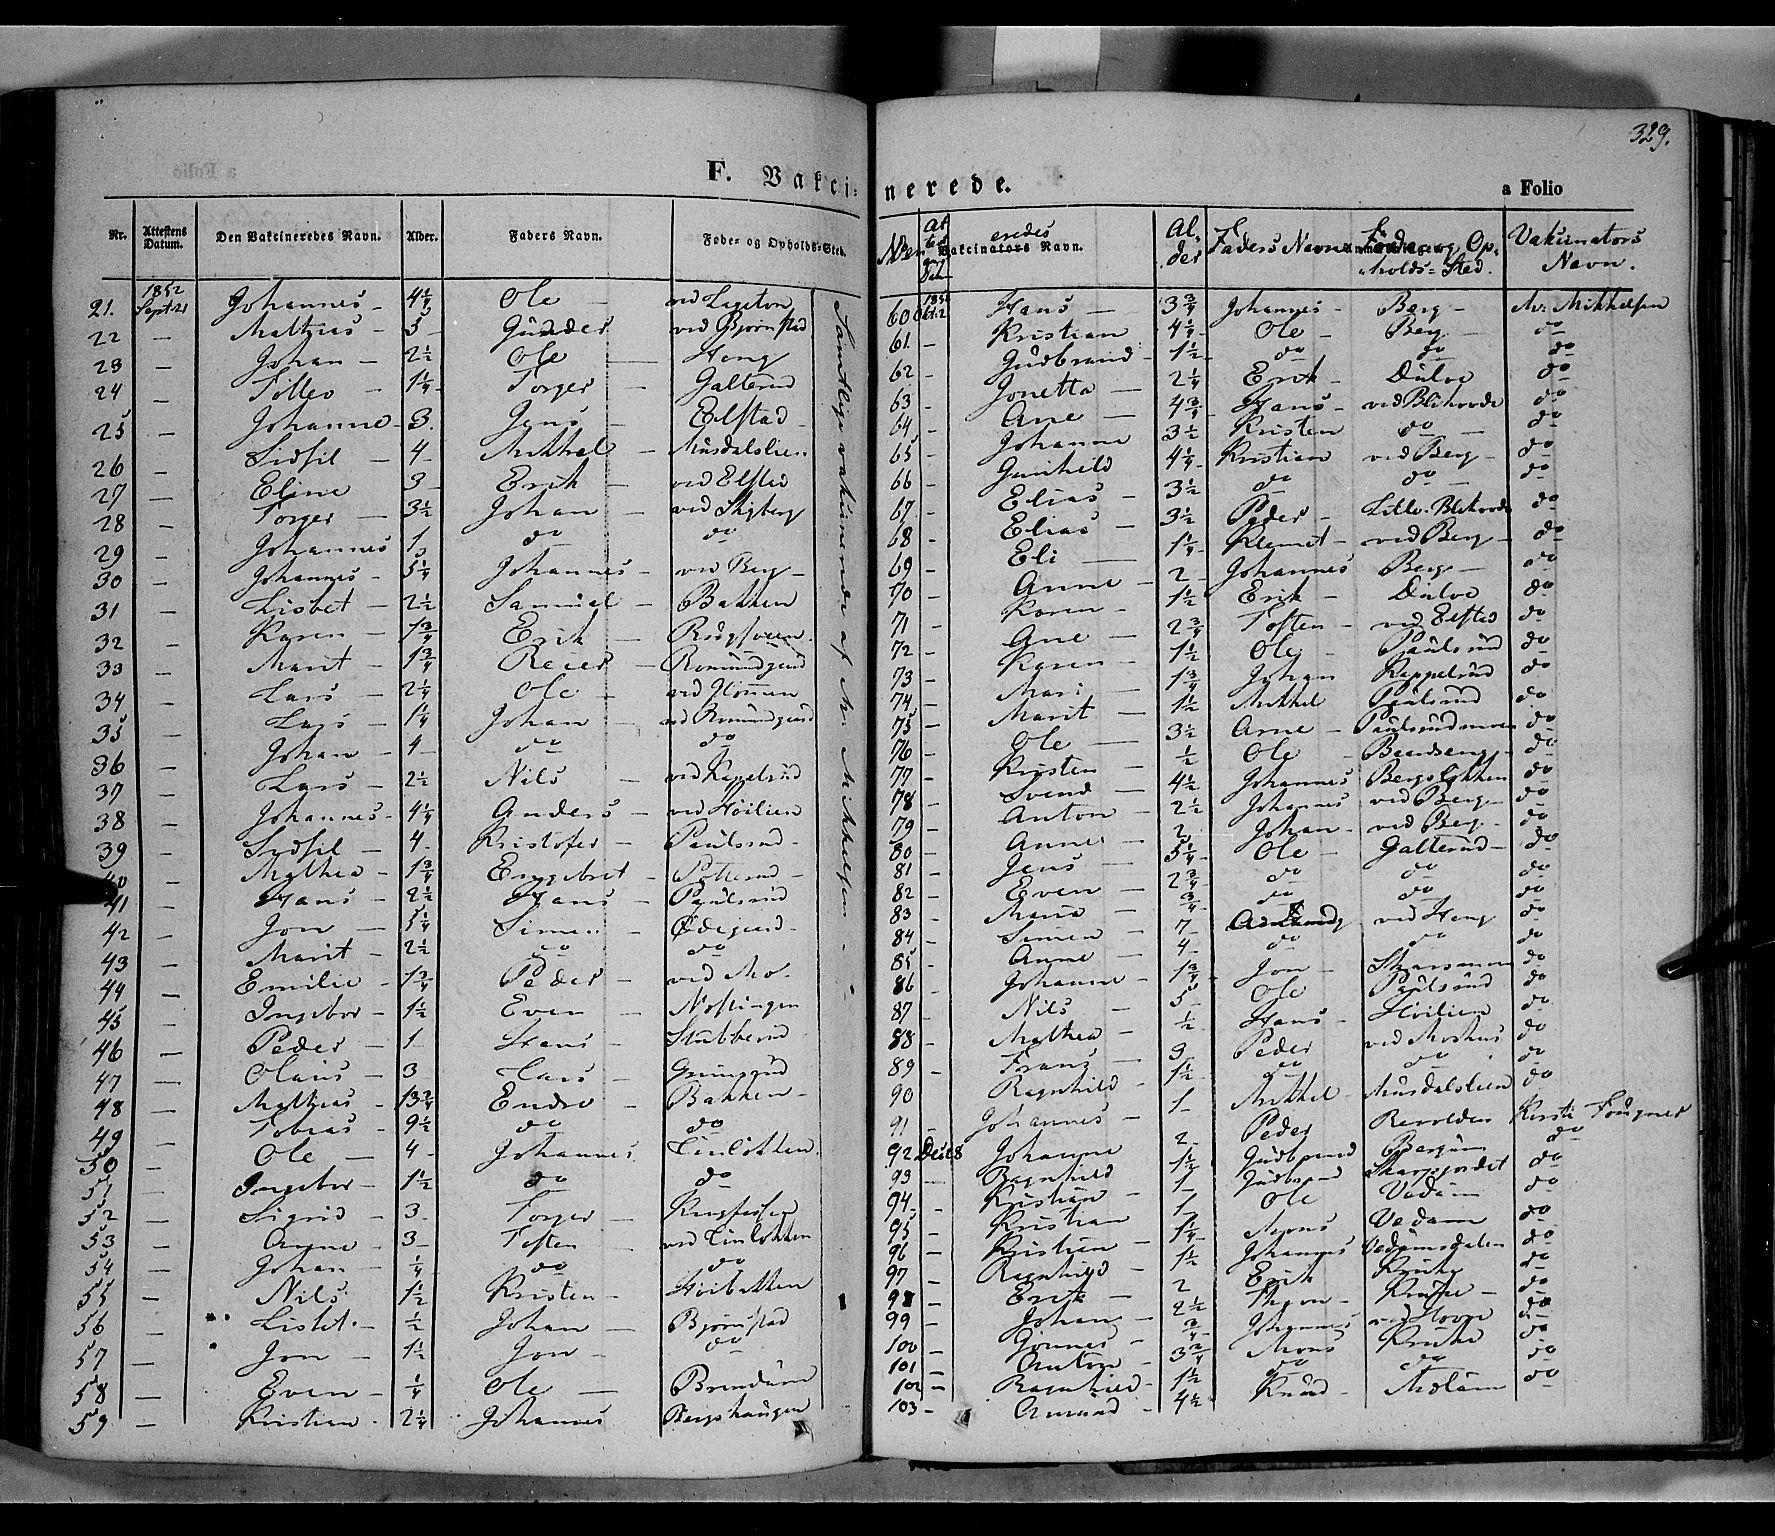 SAH, Øyer prestekontor, Ministerialbok nr. 5, 1842-1857, s. 329